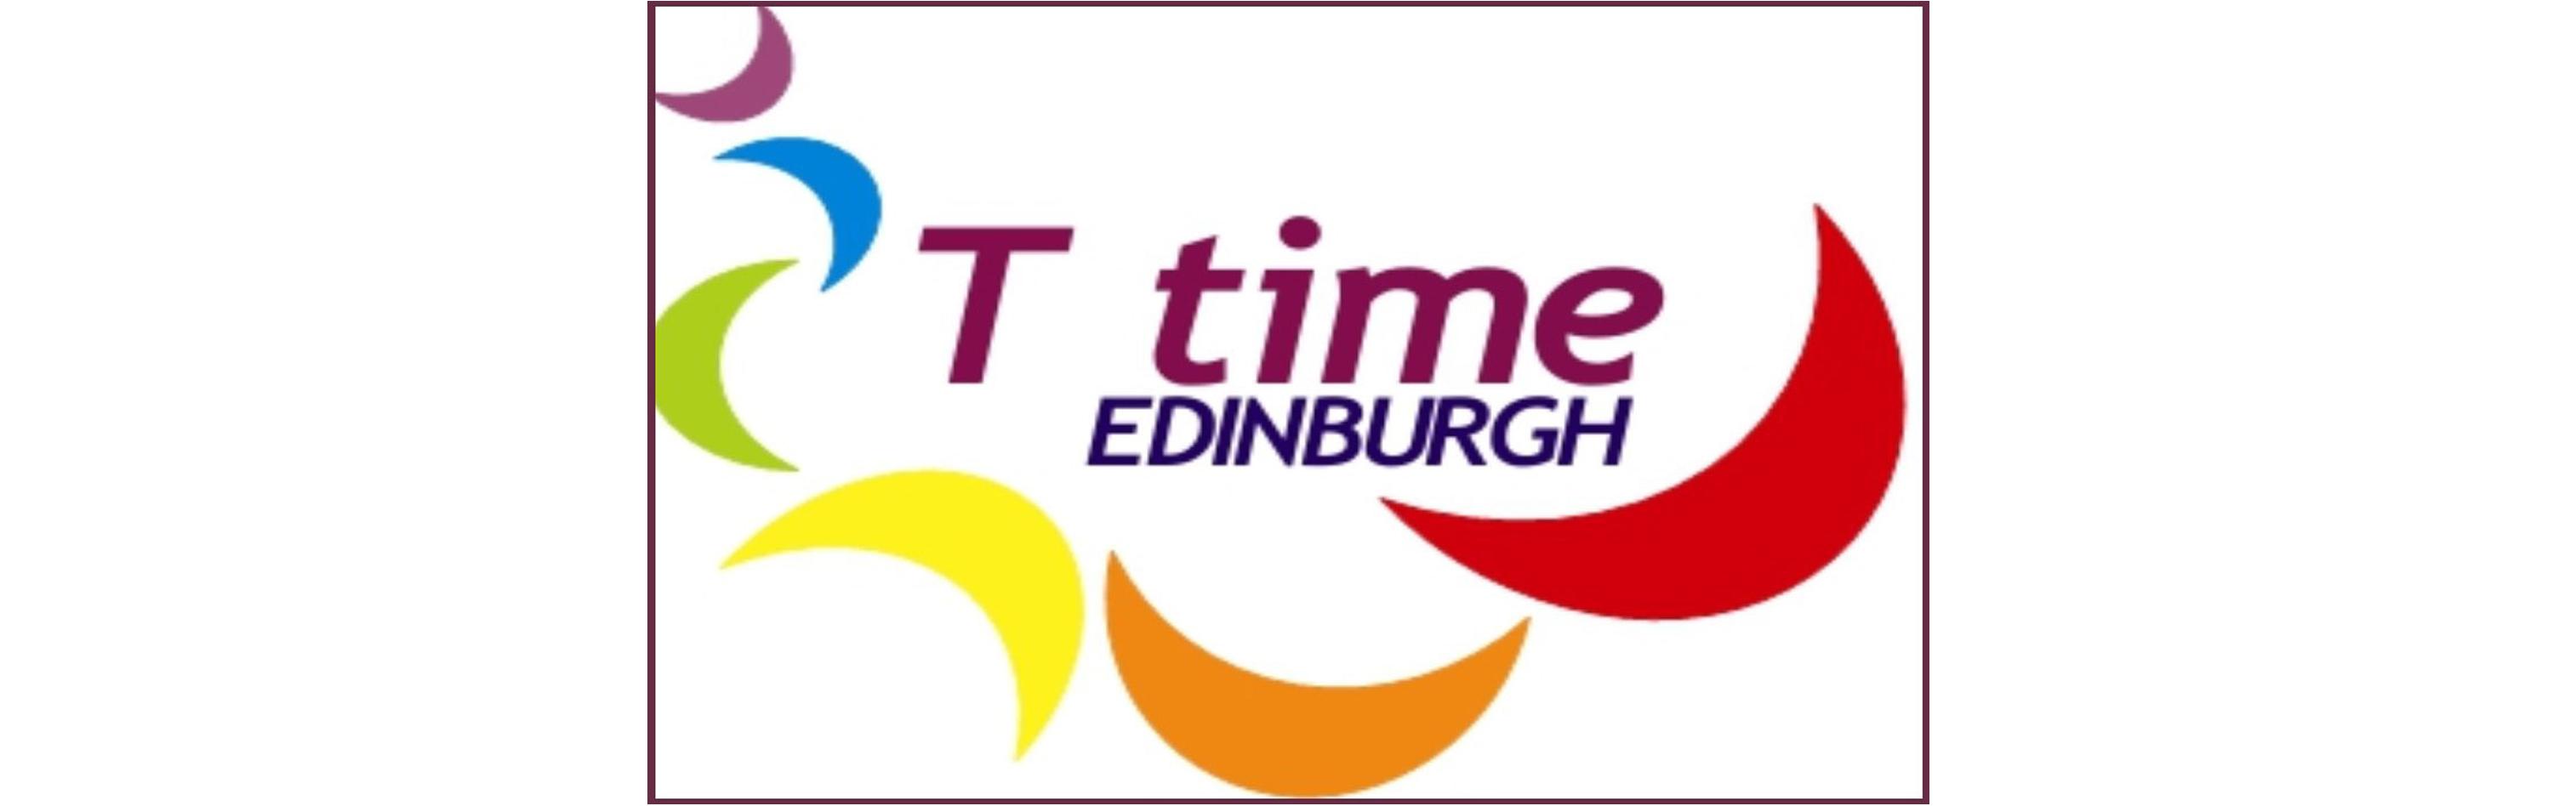 t-time-edinburgh